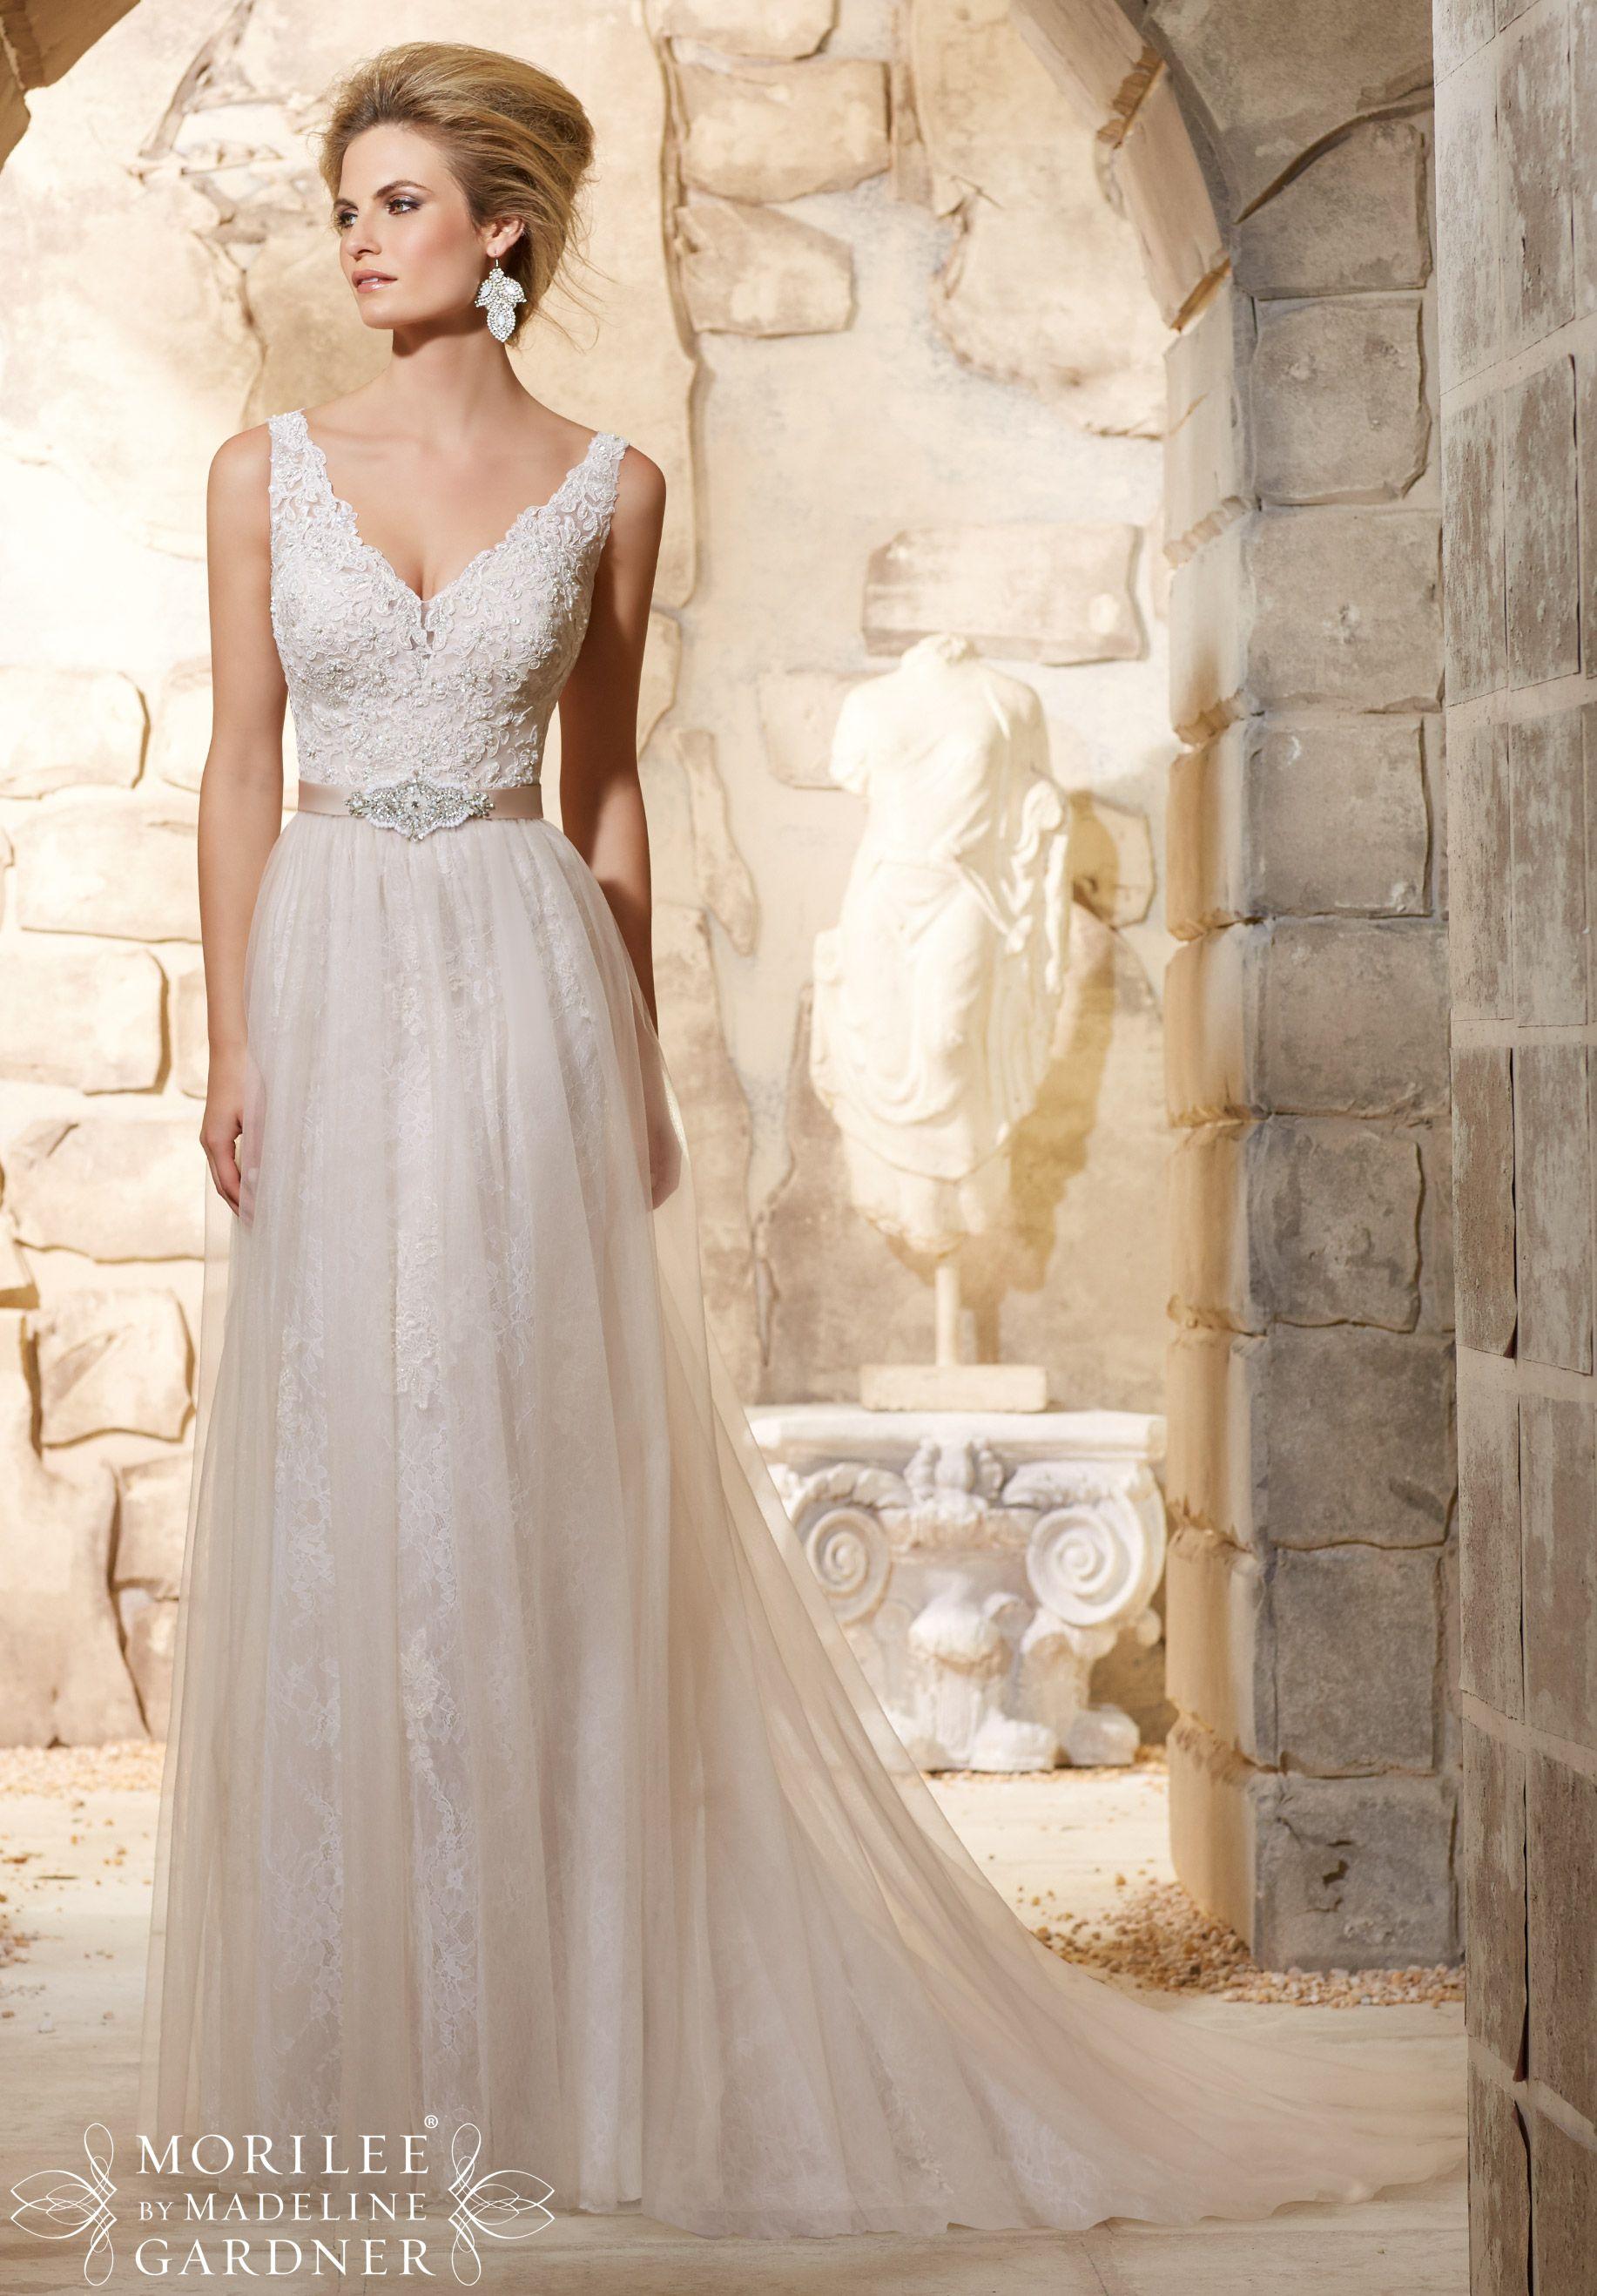 Wedding Dresses Bridal Gowns Wedding Gowns By Designer Morilee Dress Style 2780 Mori Lee Wedding Dress Wedding Dresses Ball Gowns Wedding